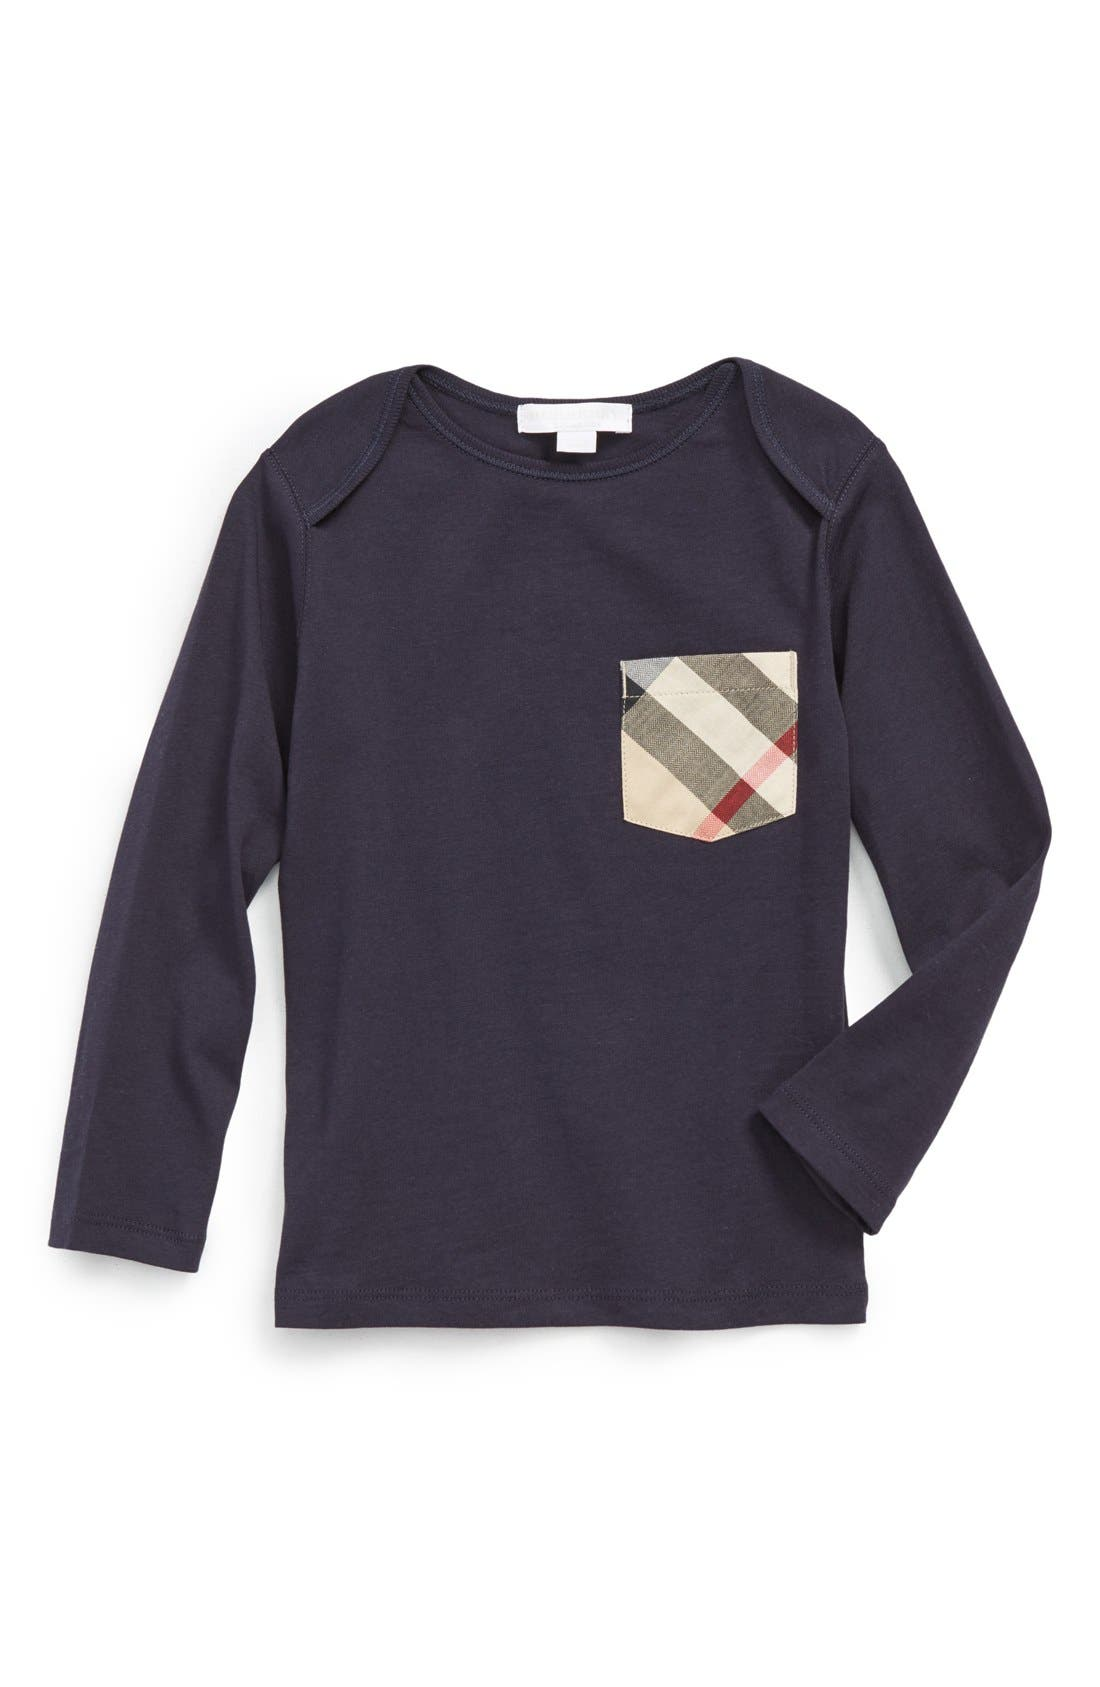 Burberry 'Callum' Check Print Chest Pocket T-Shirt (Toddler Boys)